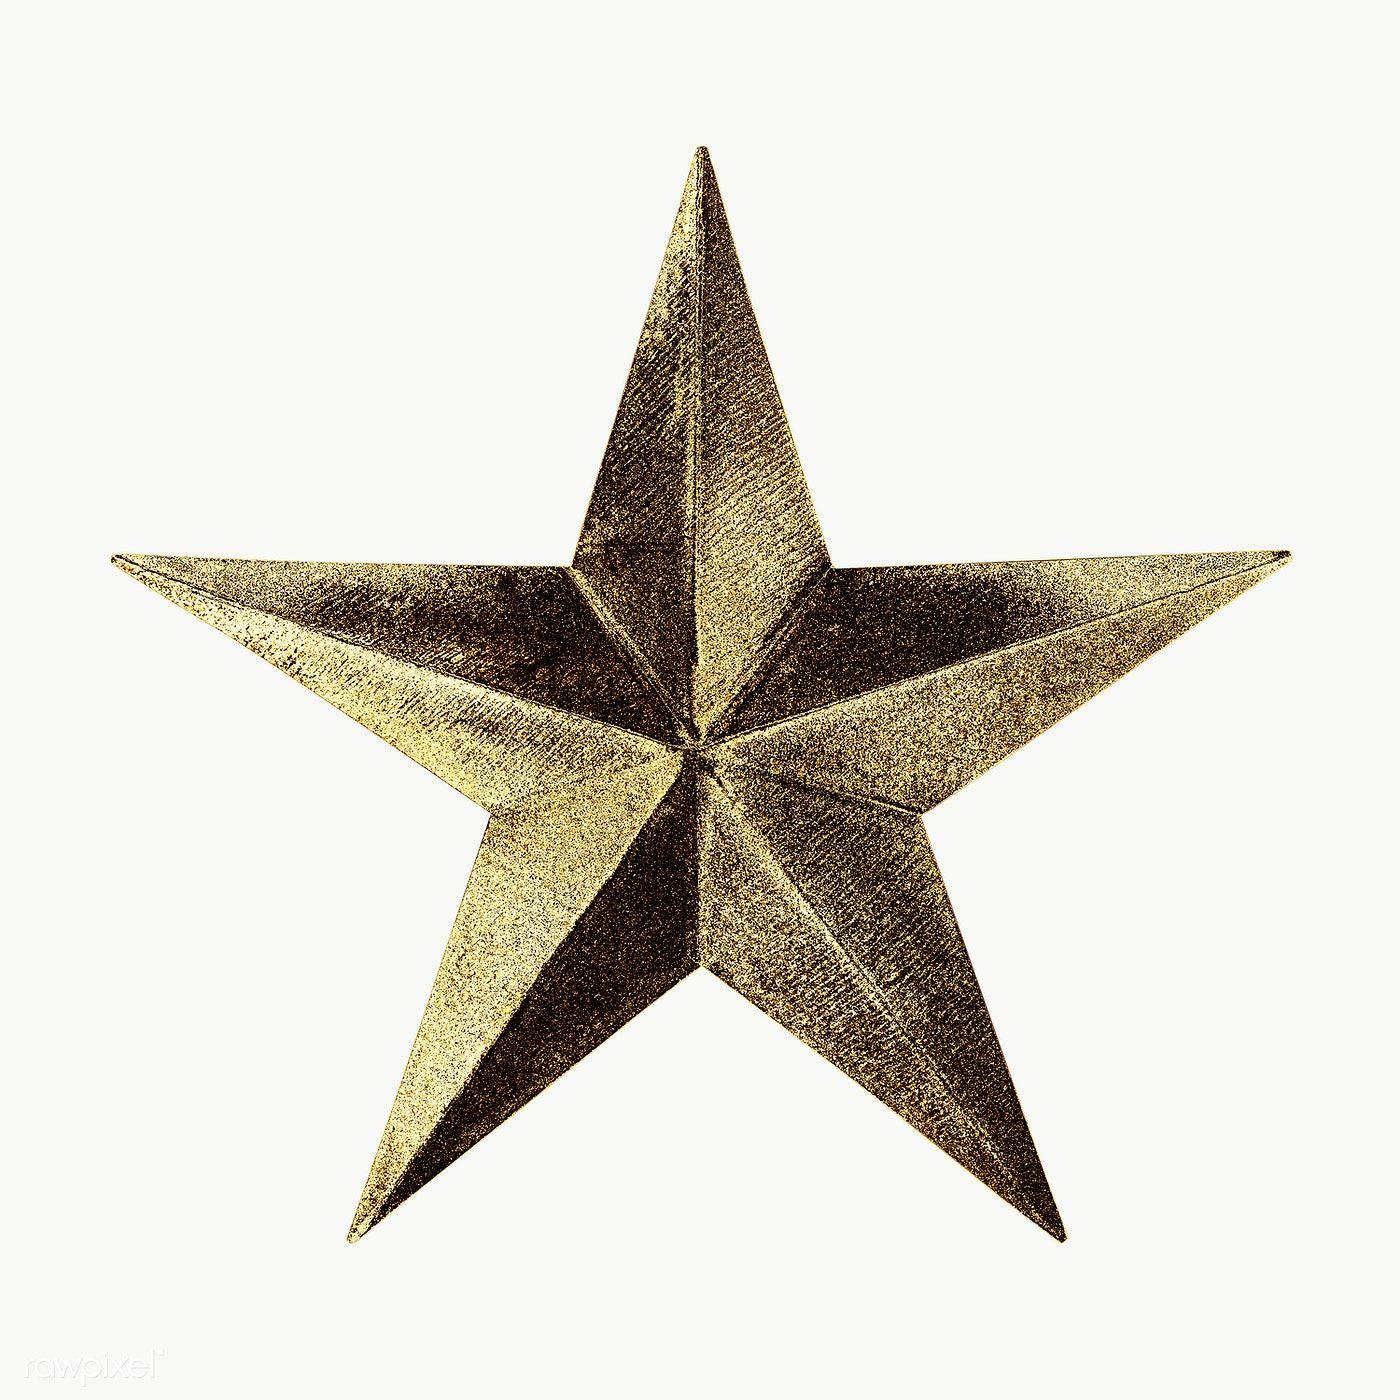 Gold Star Sticker Design Element Free Image By Rawpixel Com Winn Gold Star Stickers Gold Stars Star Stickers